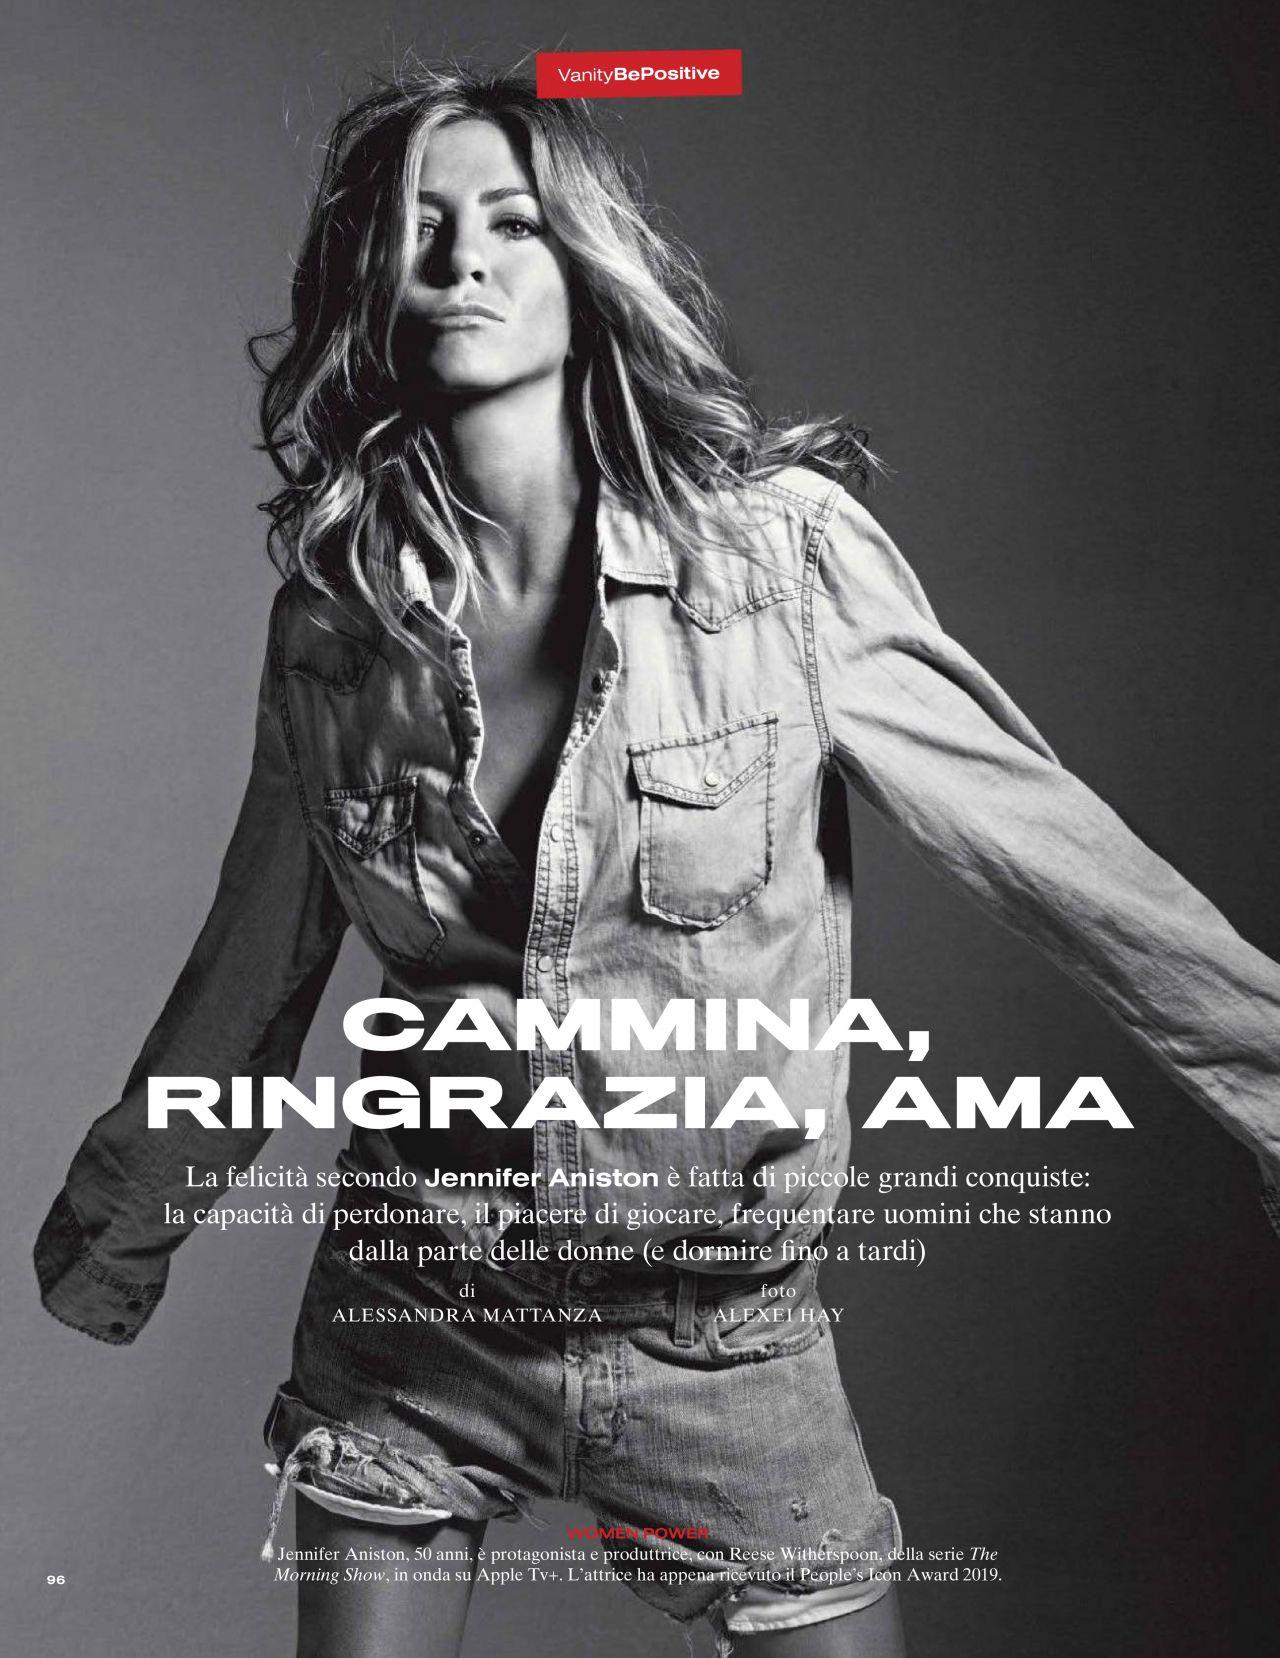 Super cougar Jennifer Aniston Vanity Fair Italy